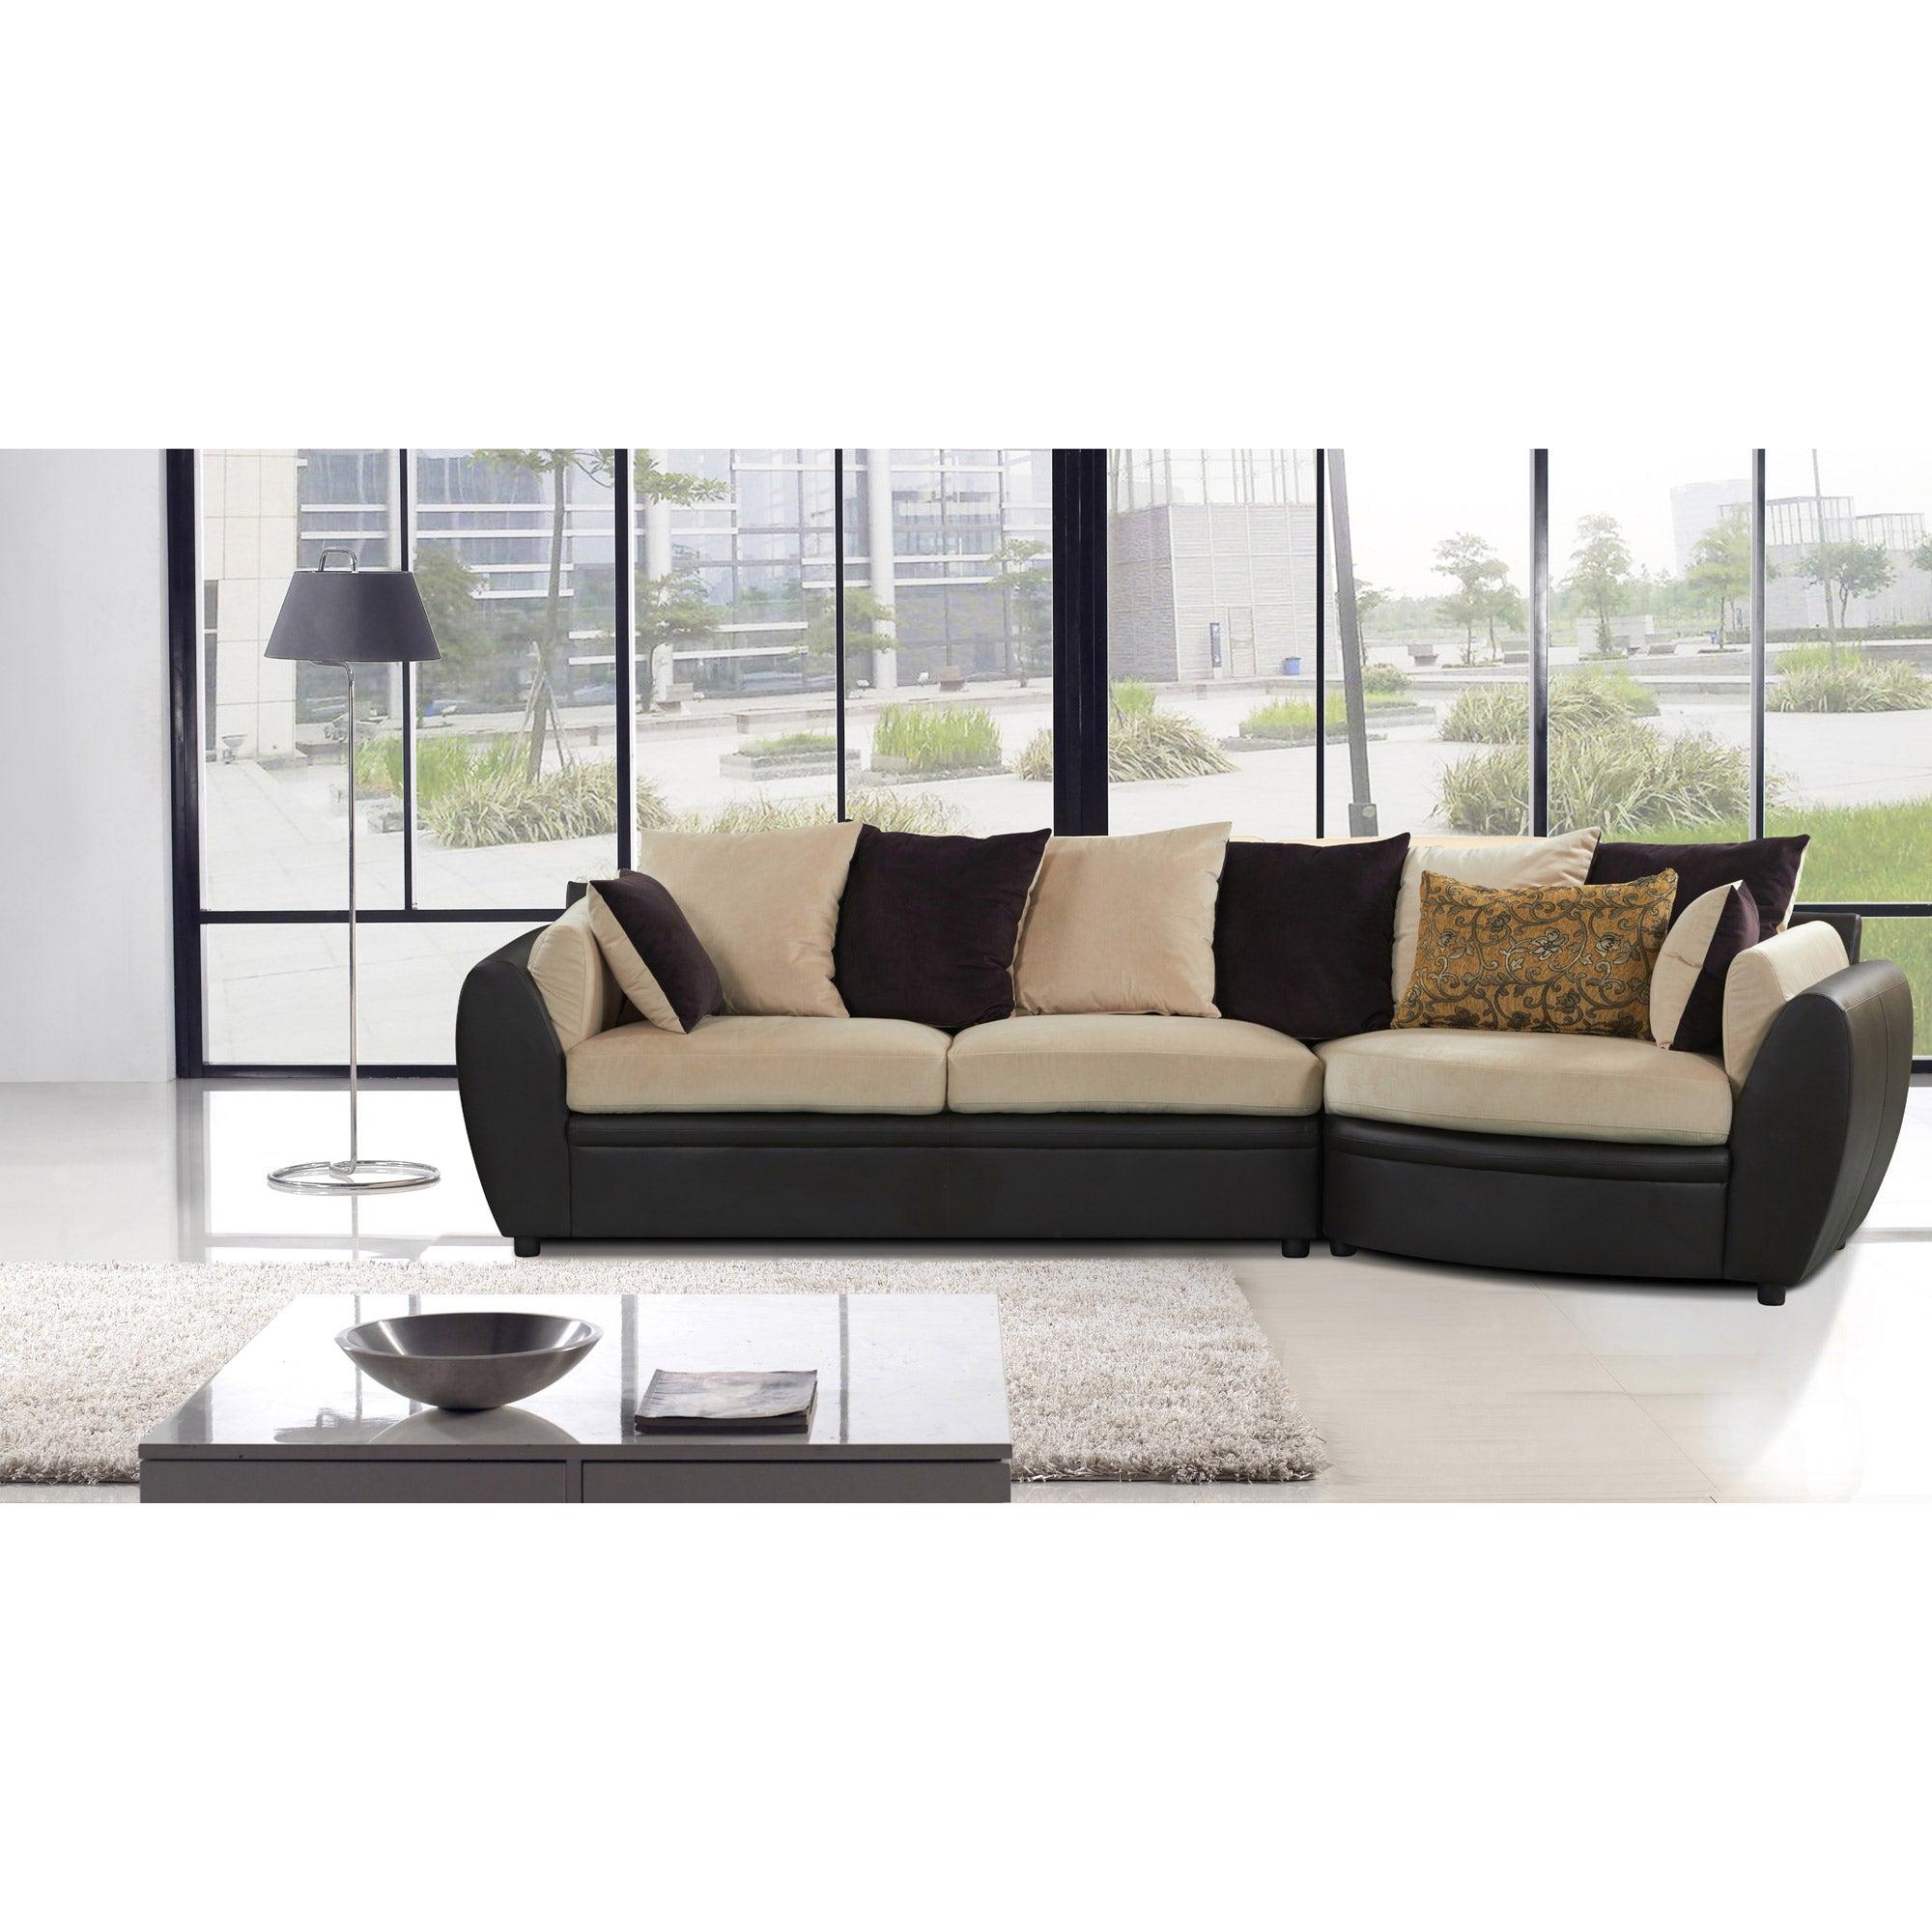 Loreta 2 pc Sectional Sofa Set Free Shipping Today Overstock